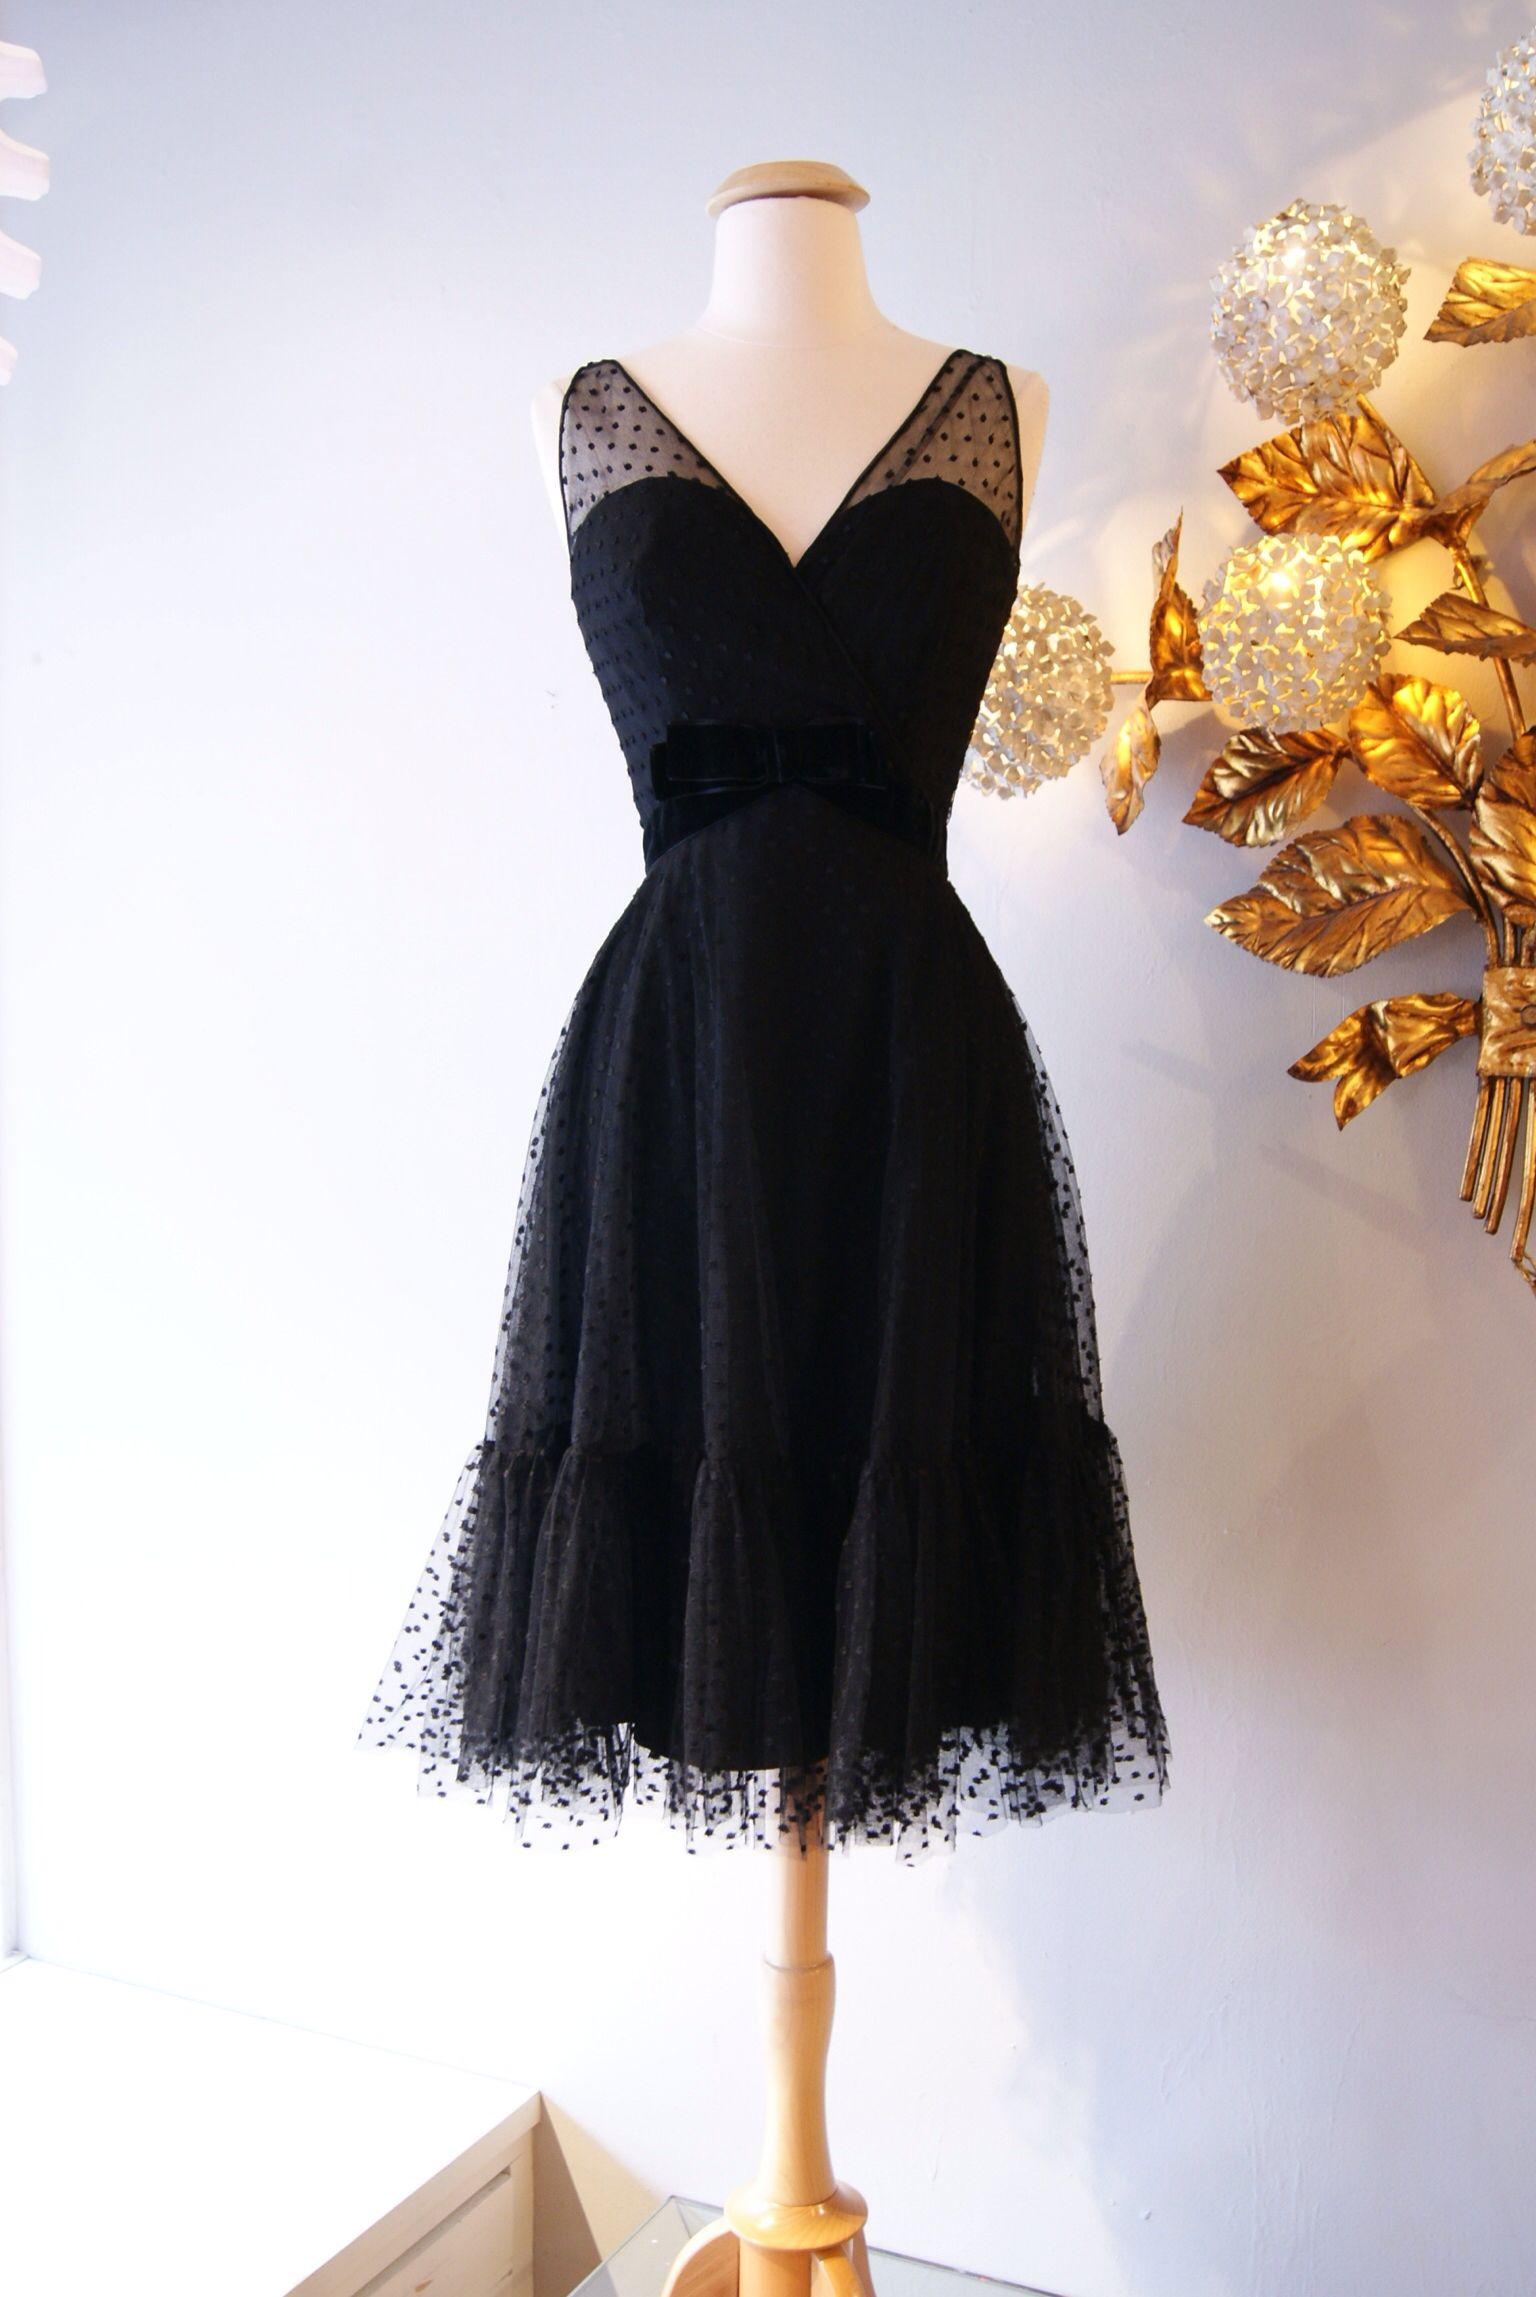 Vintage Little Black Dress From The 1960s Dress Retro Partydress Fashion Vintage Promdress Cocktail Dress Highen Little Black Dress Black Dress Fashion [ 2297 x 1536 Pixel ]